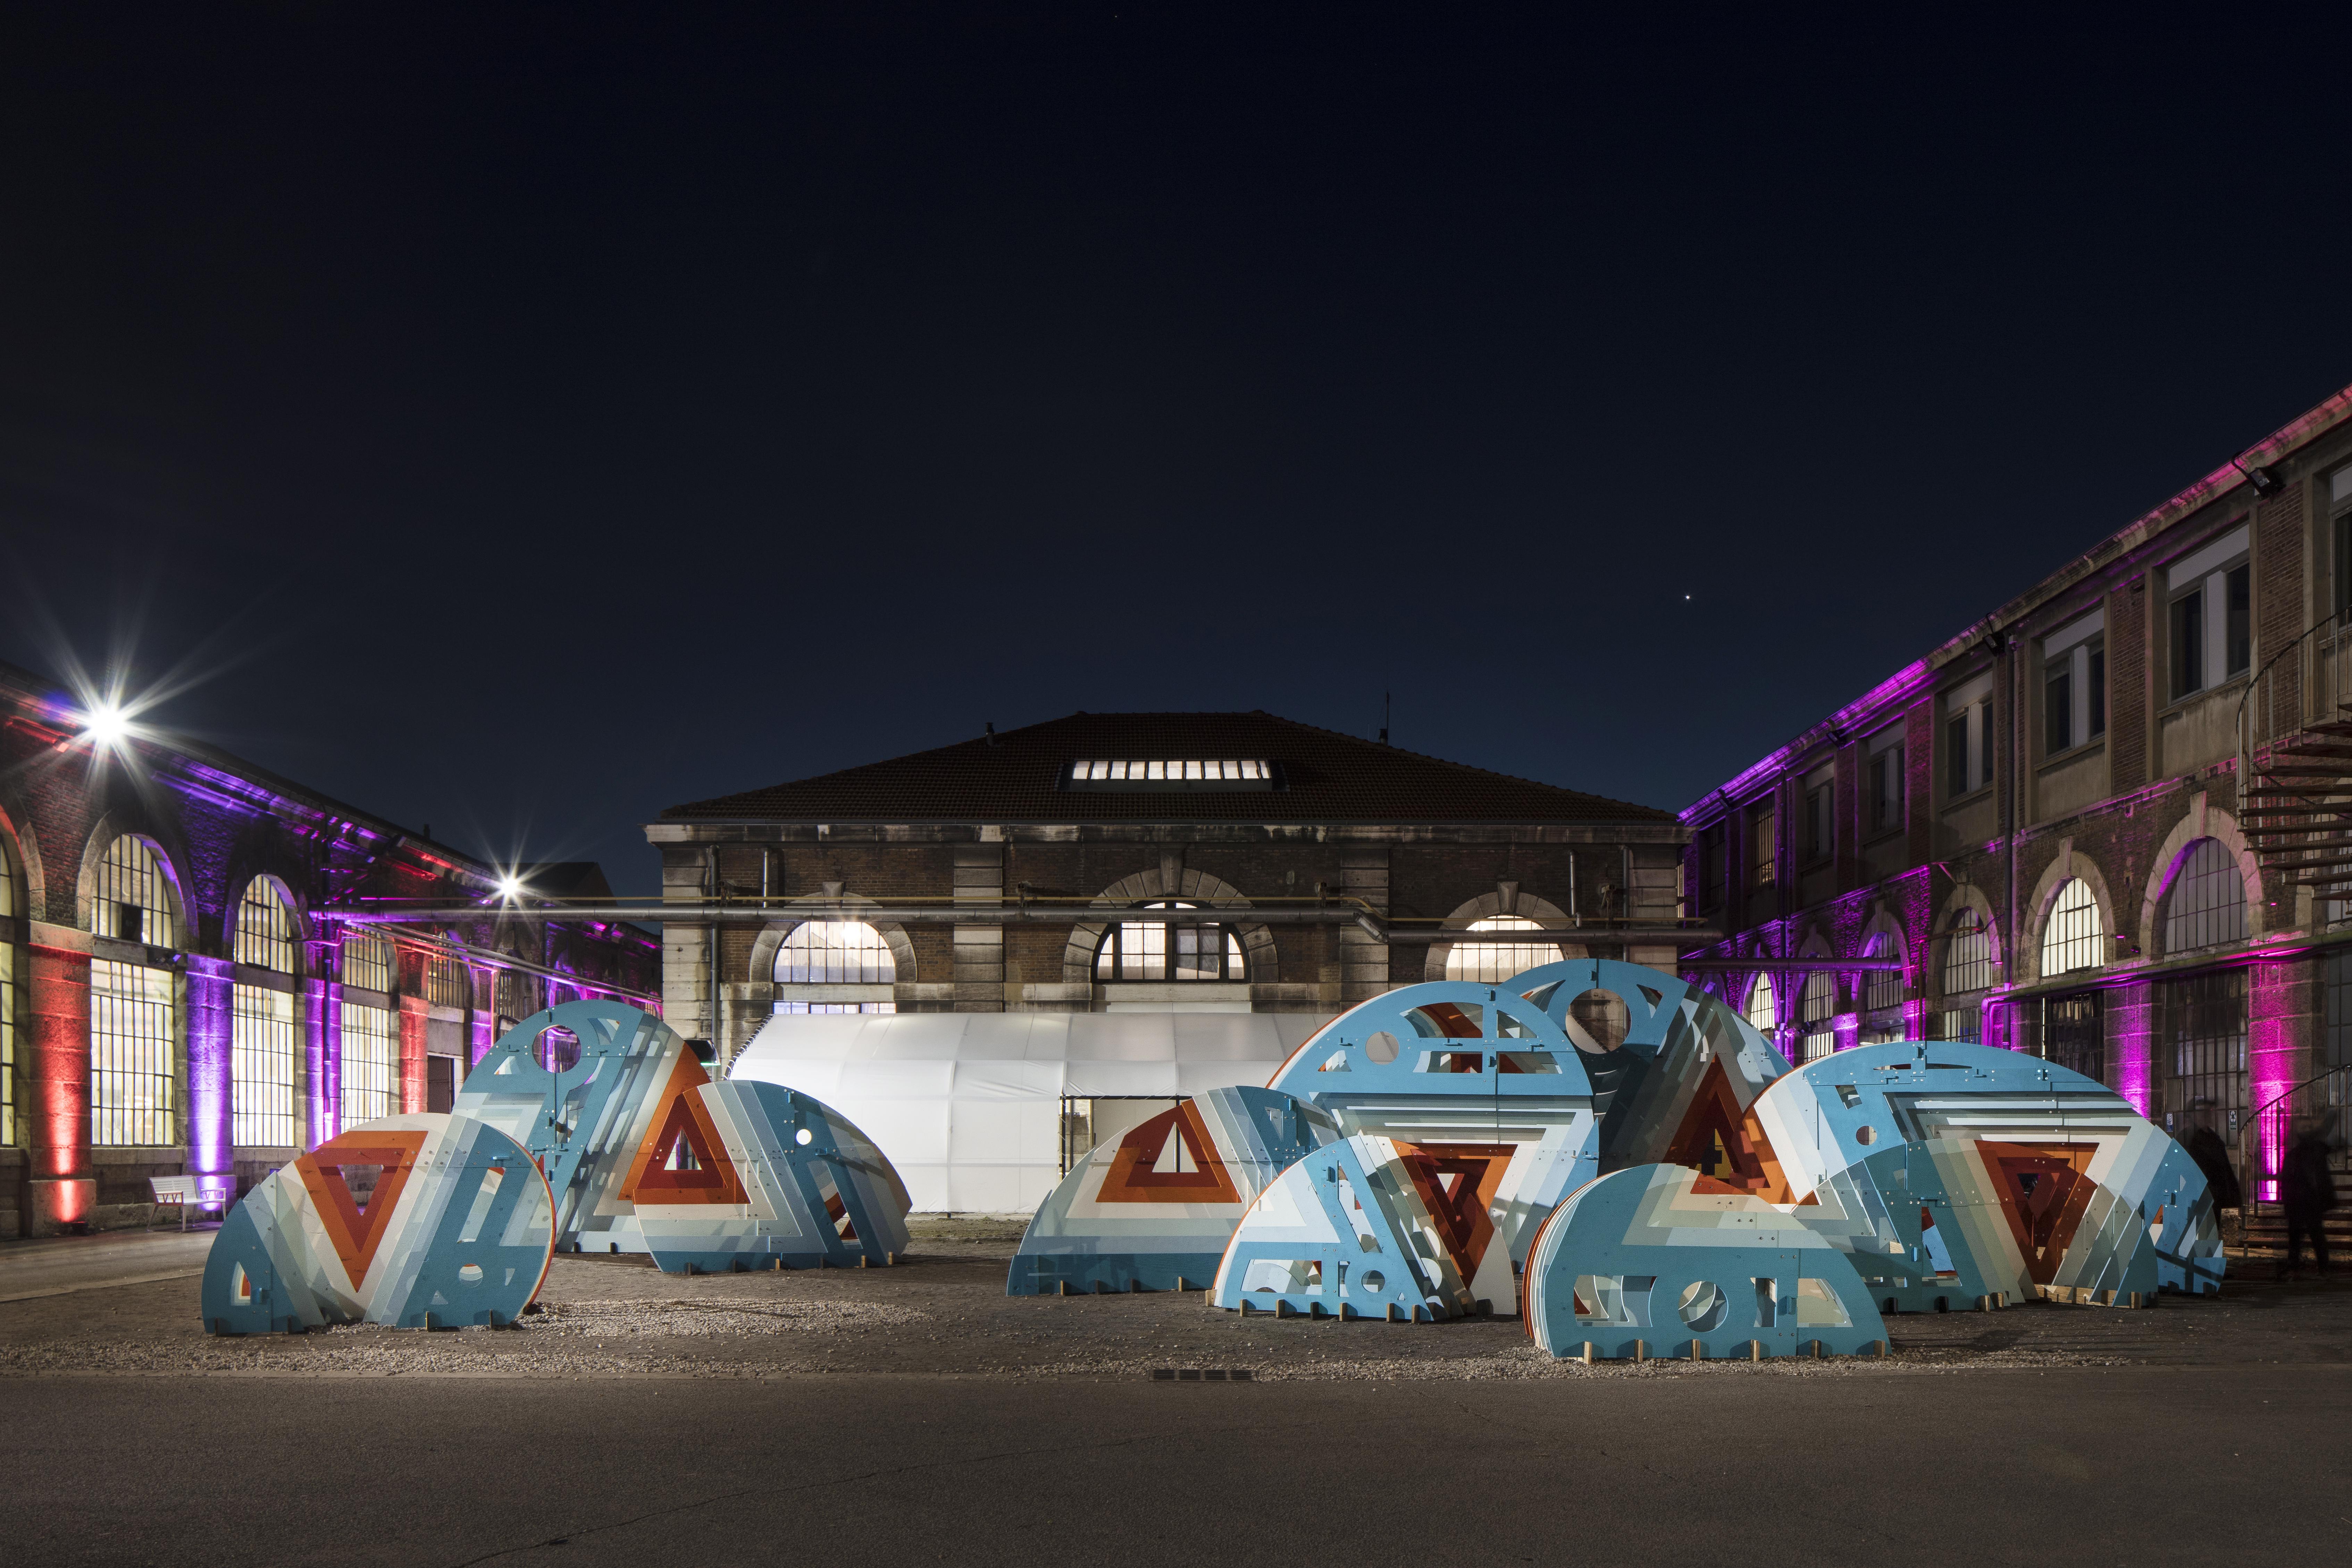 Akoaki | Detroit Afrikan Funkestra, Saint Etienne, France, 2017. By Anne-laure Lechat